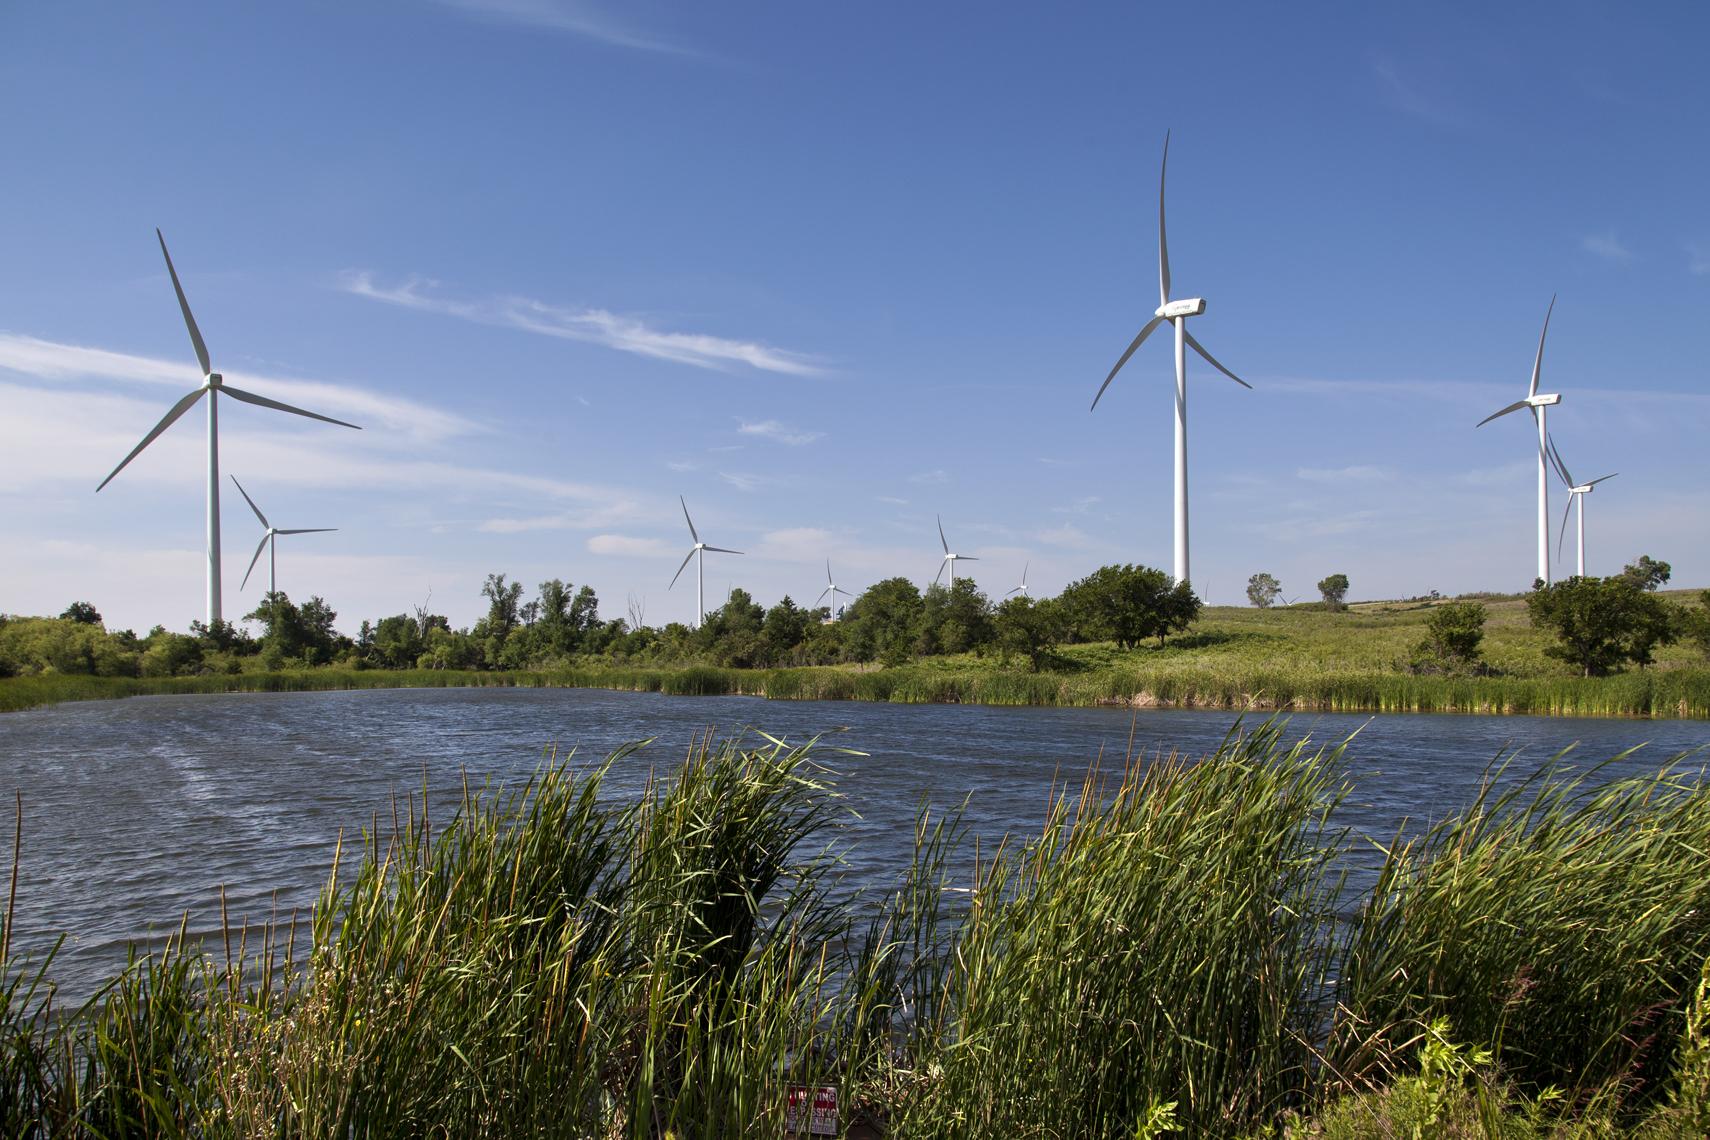 windmills in a middow near a lake